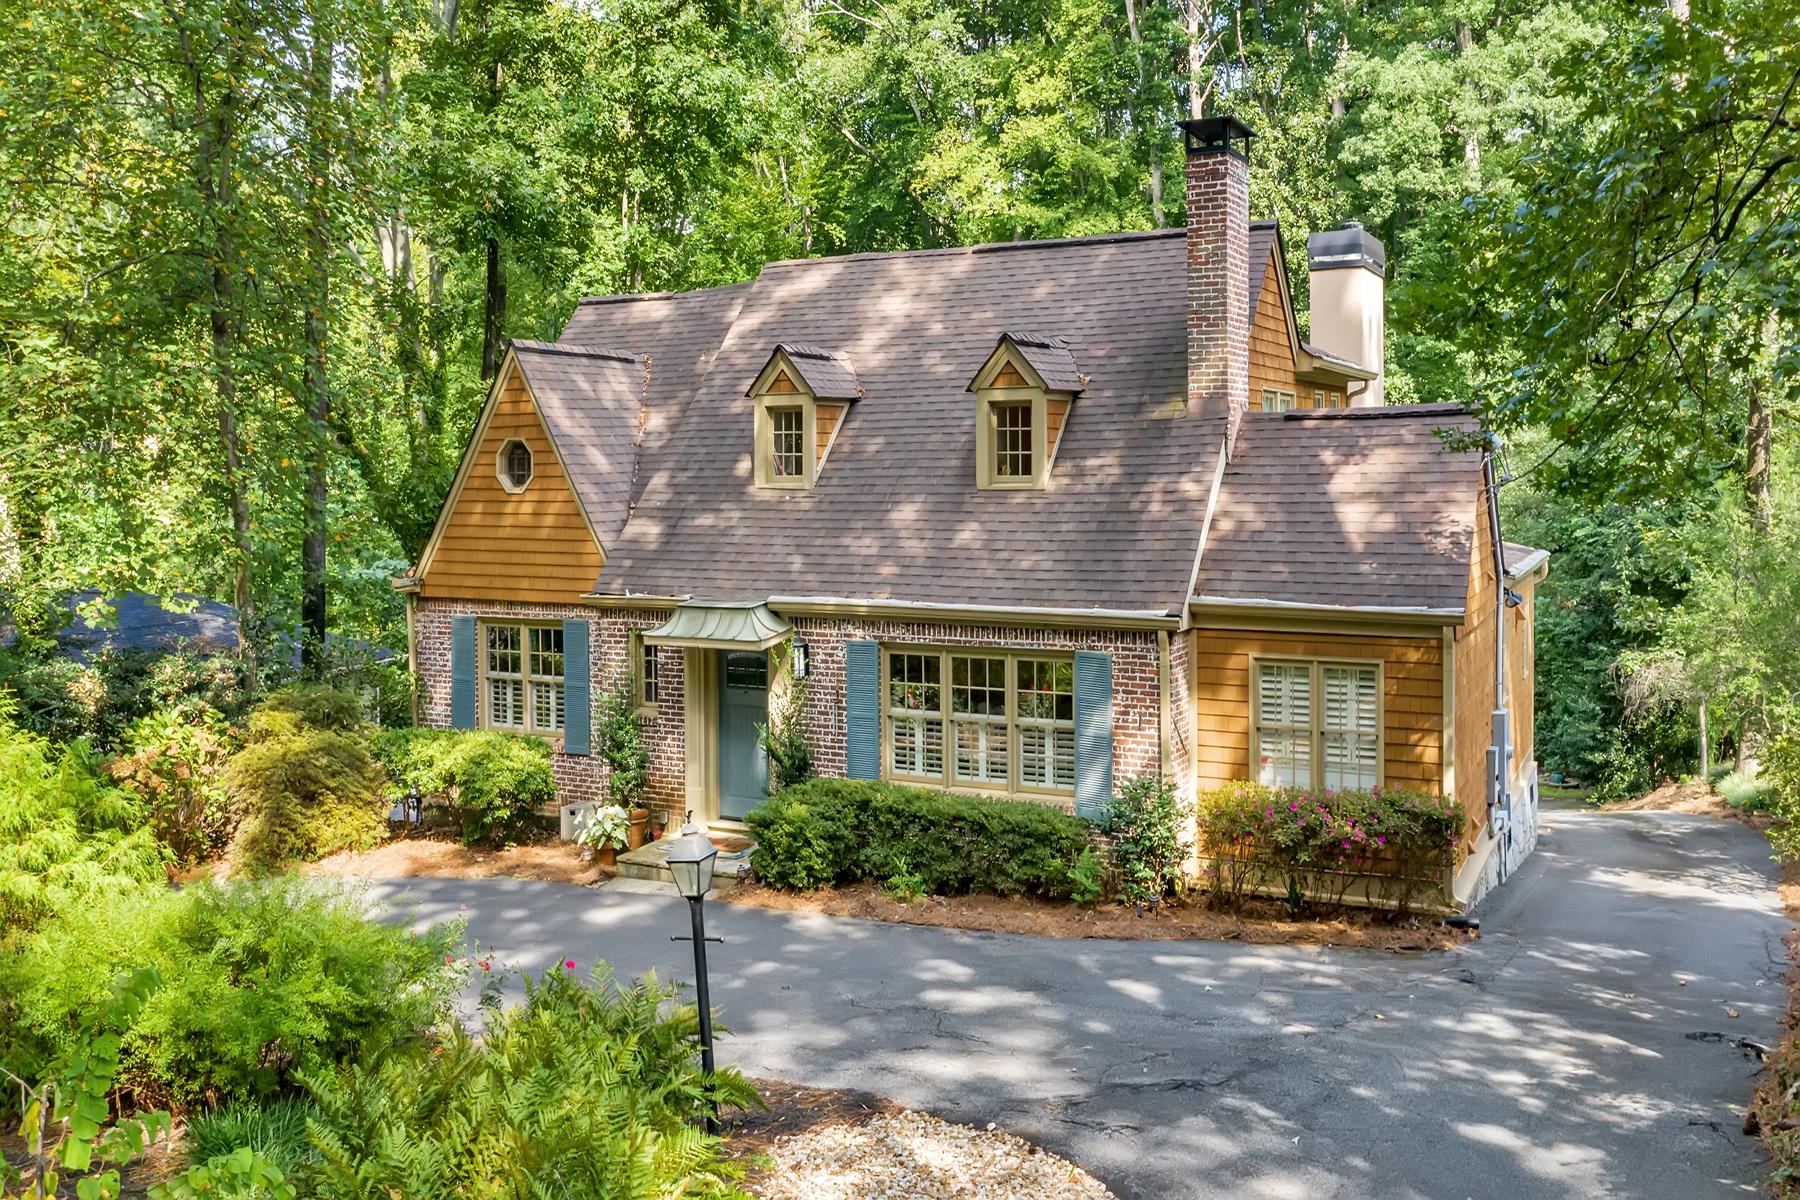 Single Family Homes для того Продажа на Stunning Home by Harrison Design with Farmhouse Style 3837 Peachtree Dunwoody Road NE, Atlanta, Джорджия 30342 Соединенные Штаты